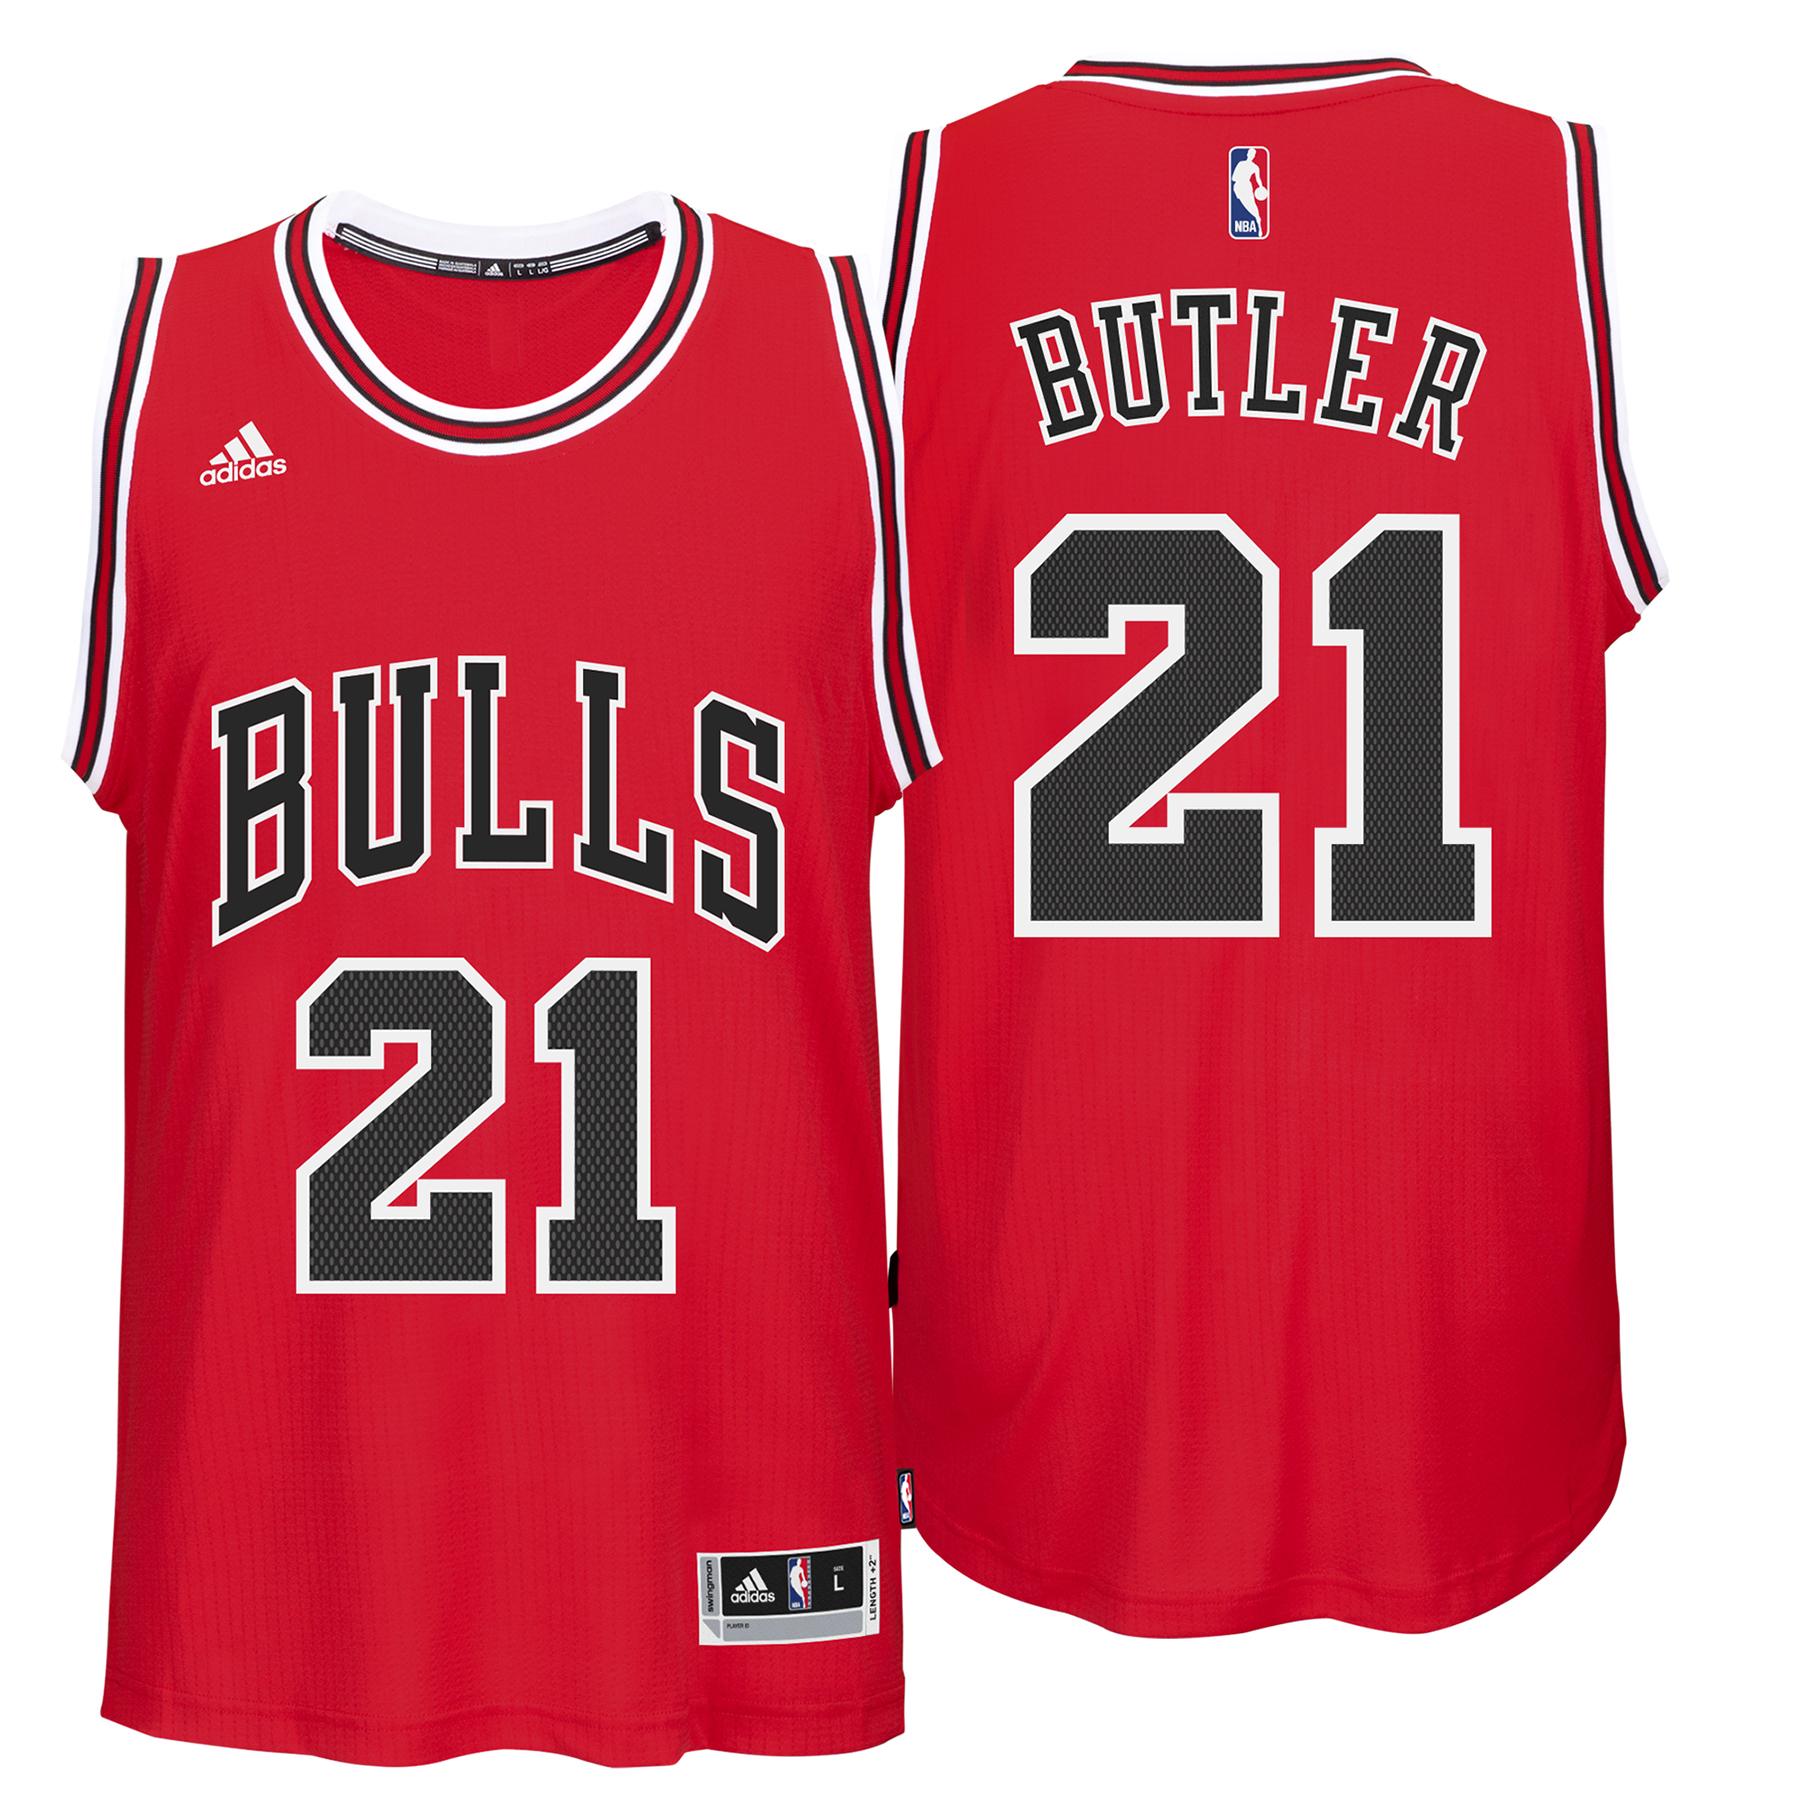 Chicago Bulls Road Swingman Jersey - Jimmy Butler - Youths